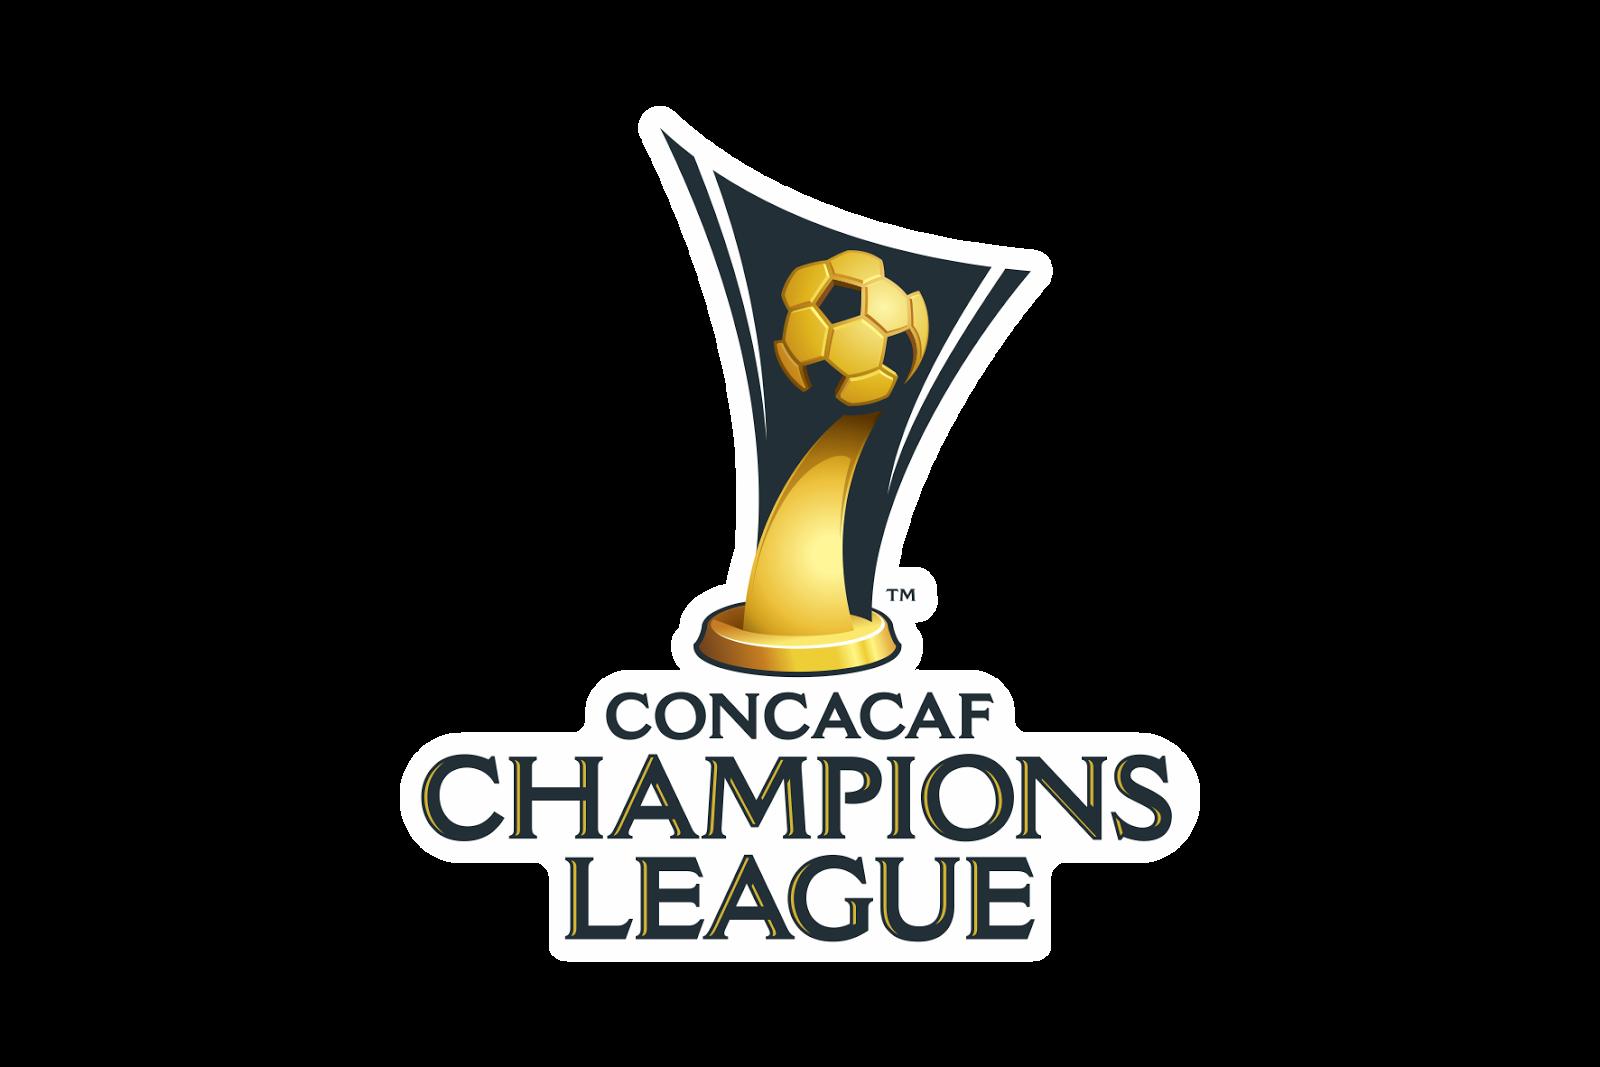 concacaf champions league logo